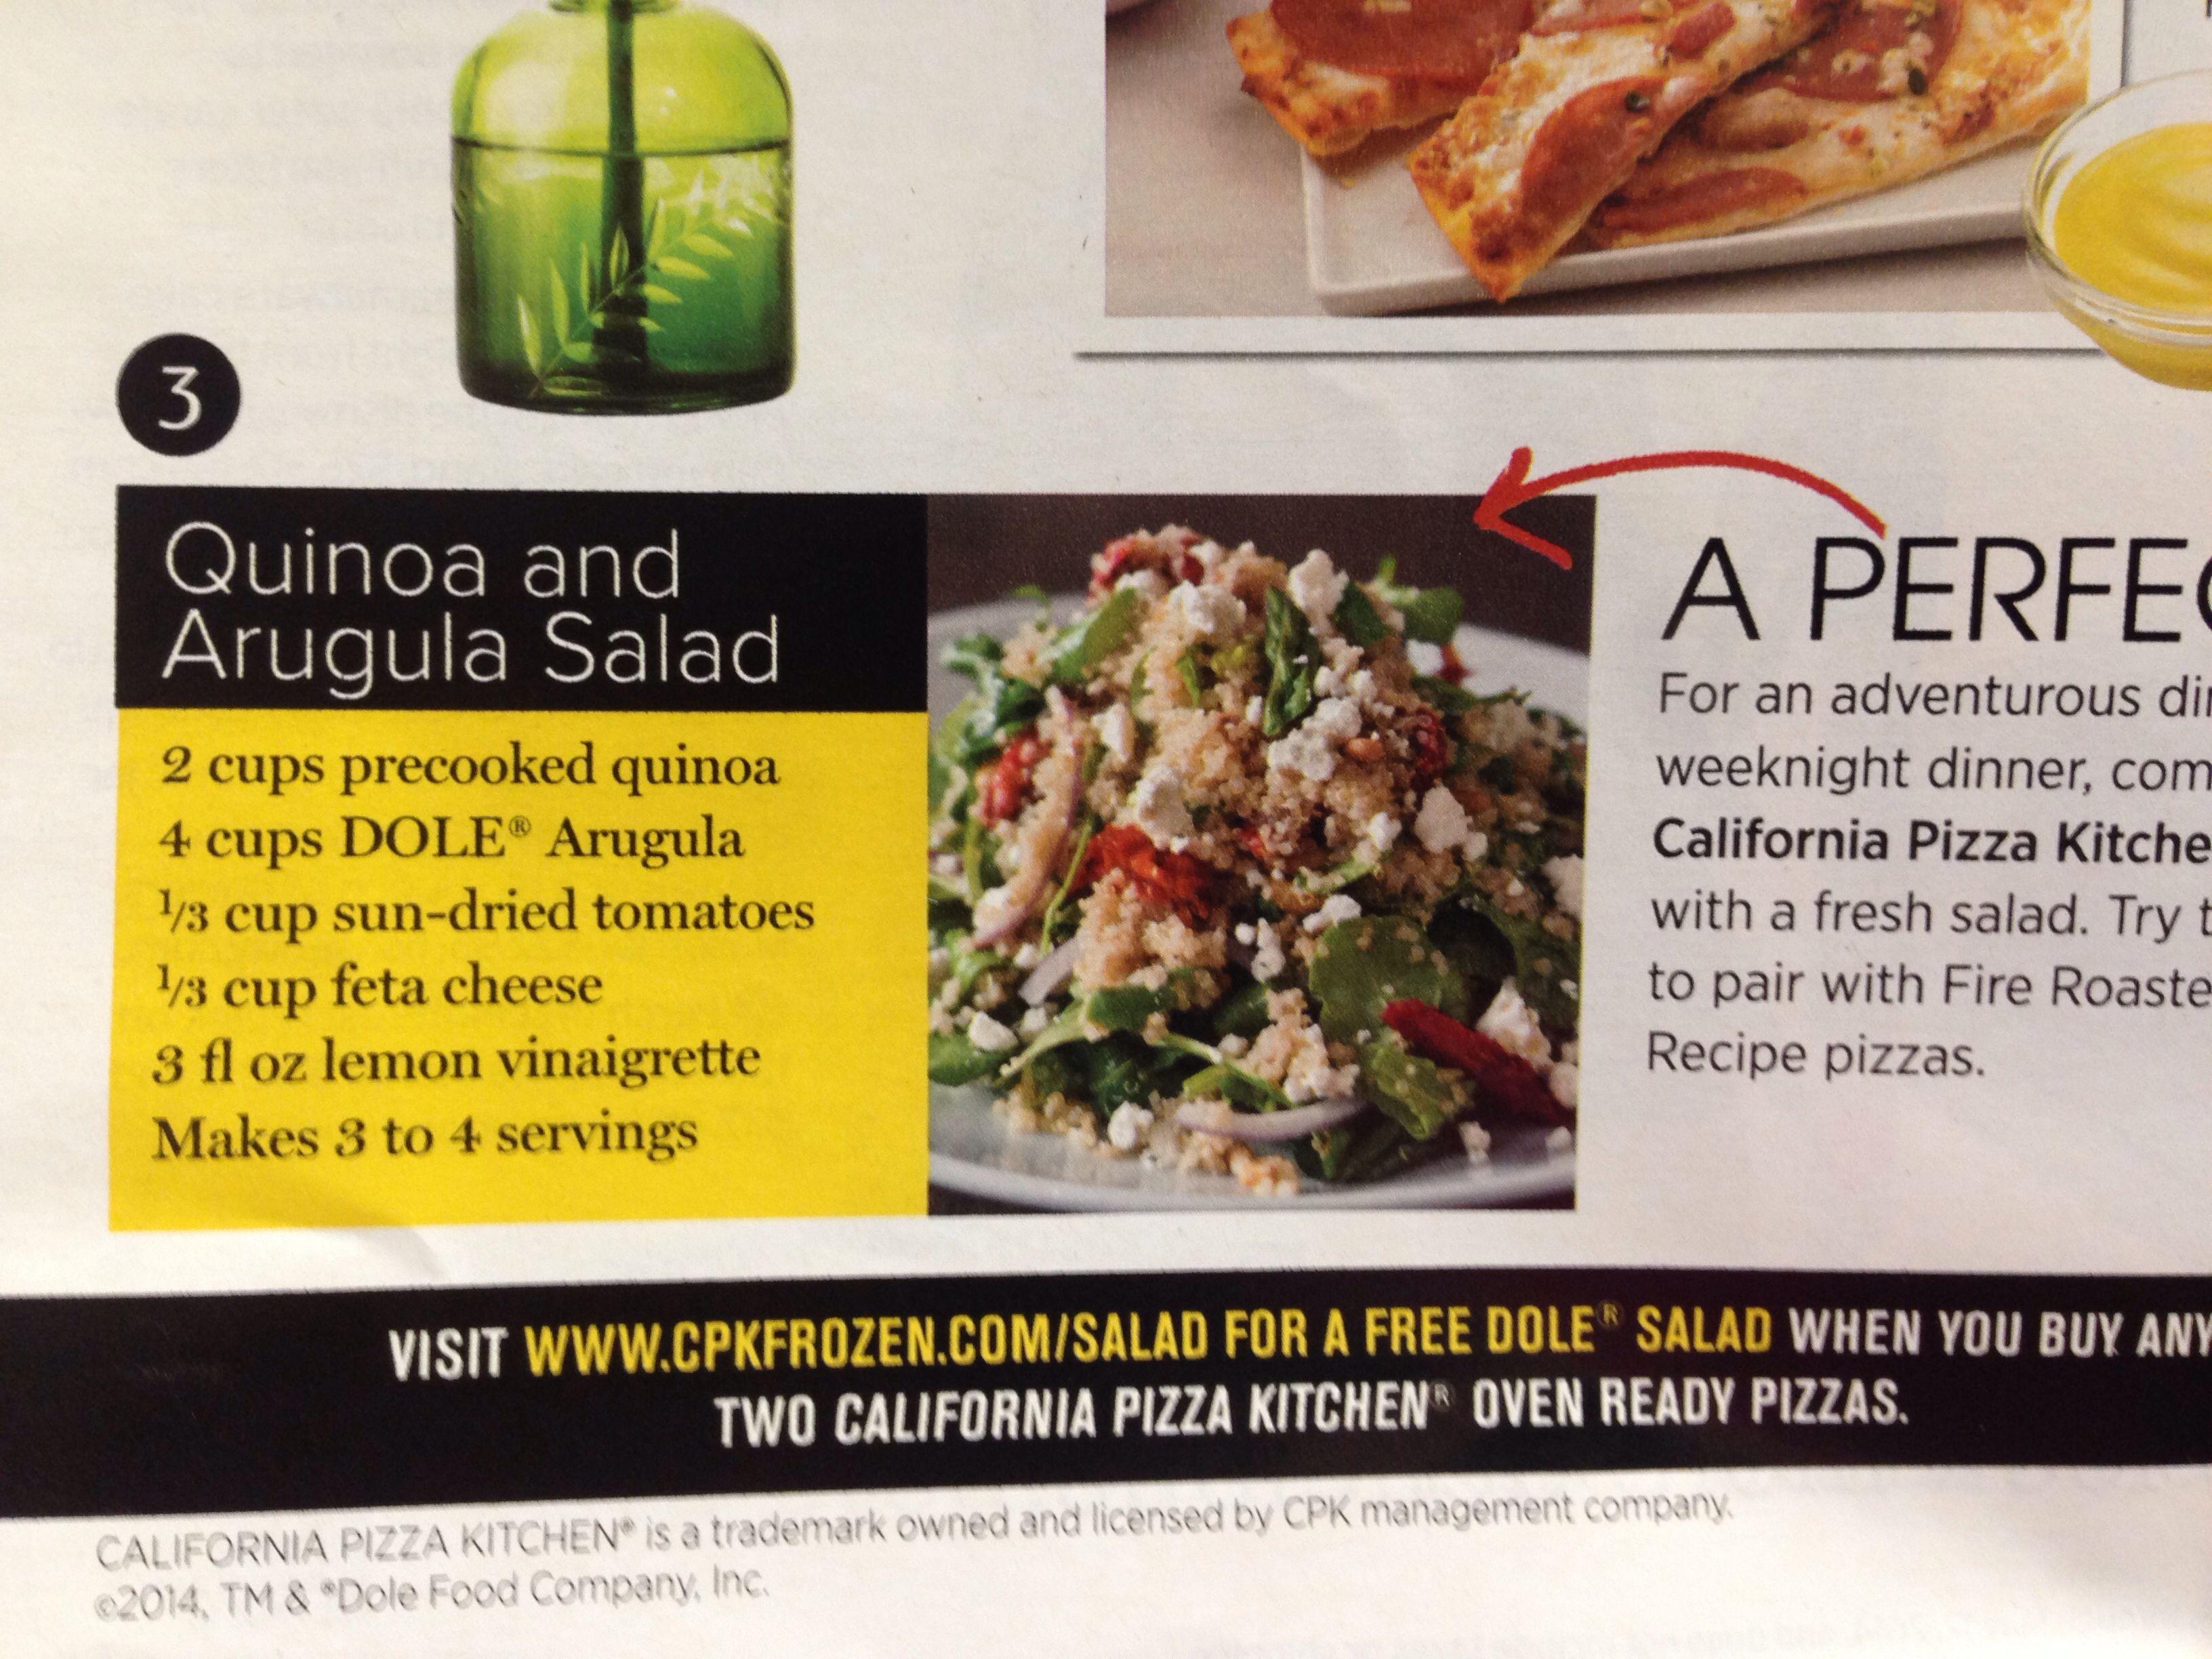 Quinoa and arugula salad | Healthy Eating | Pinterest